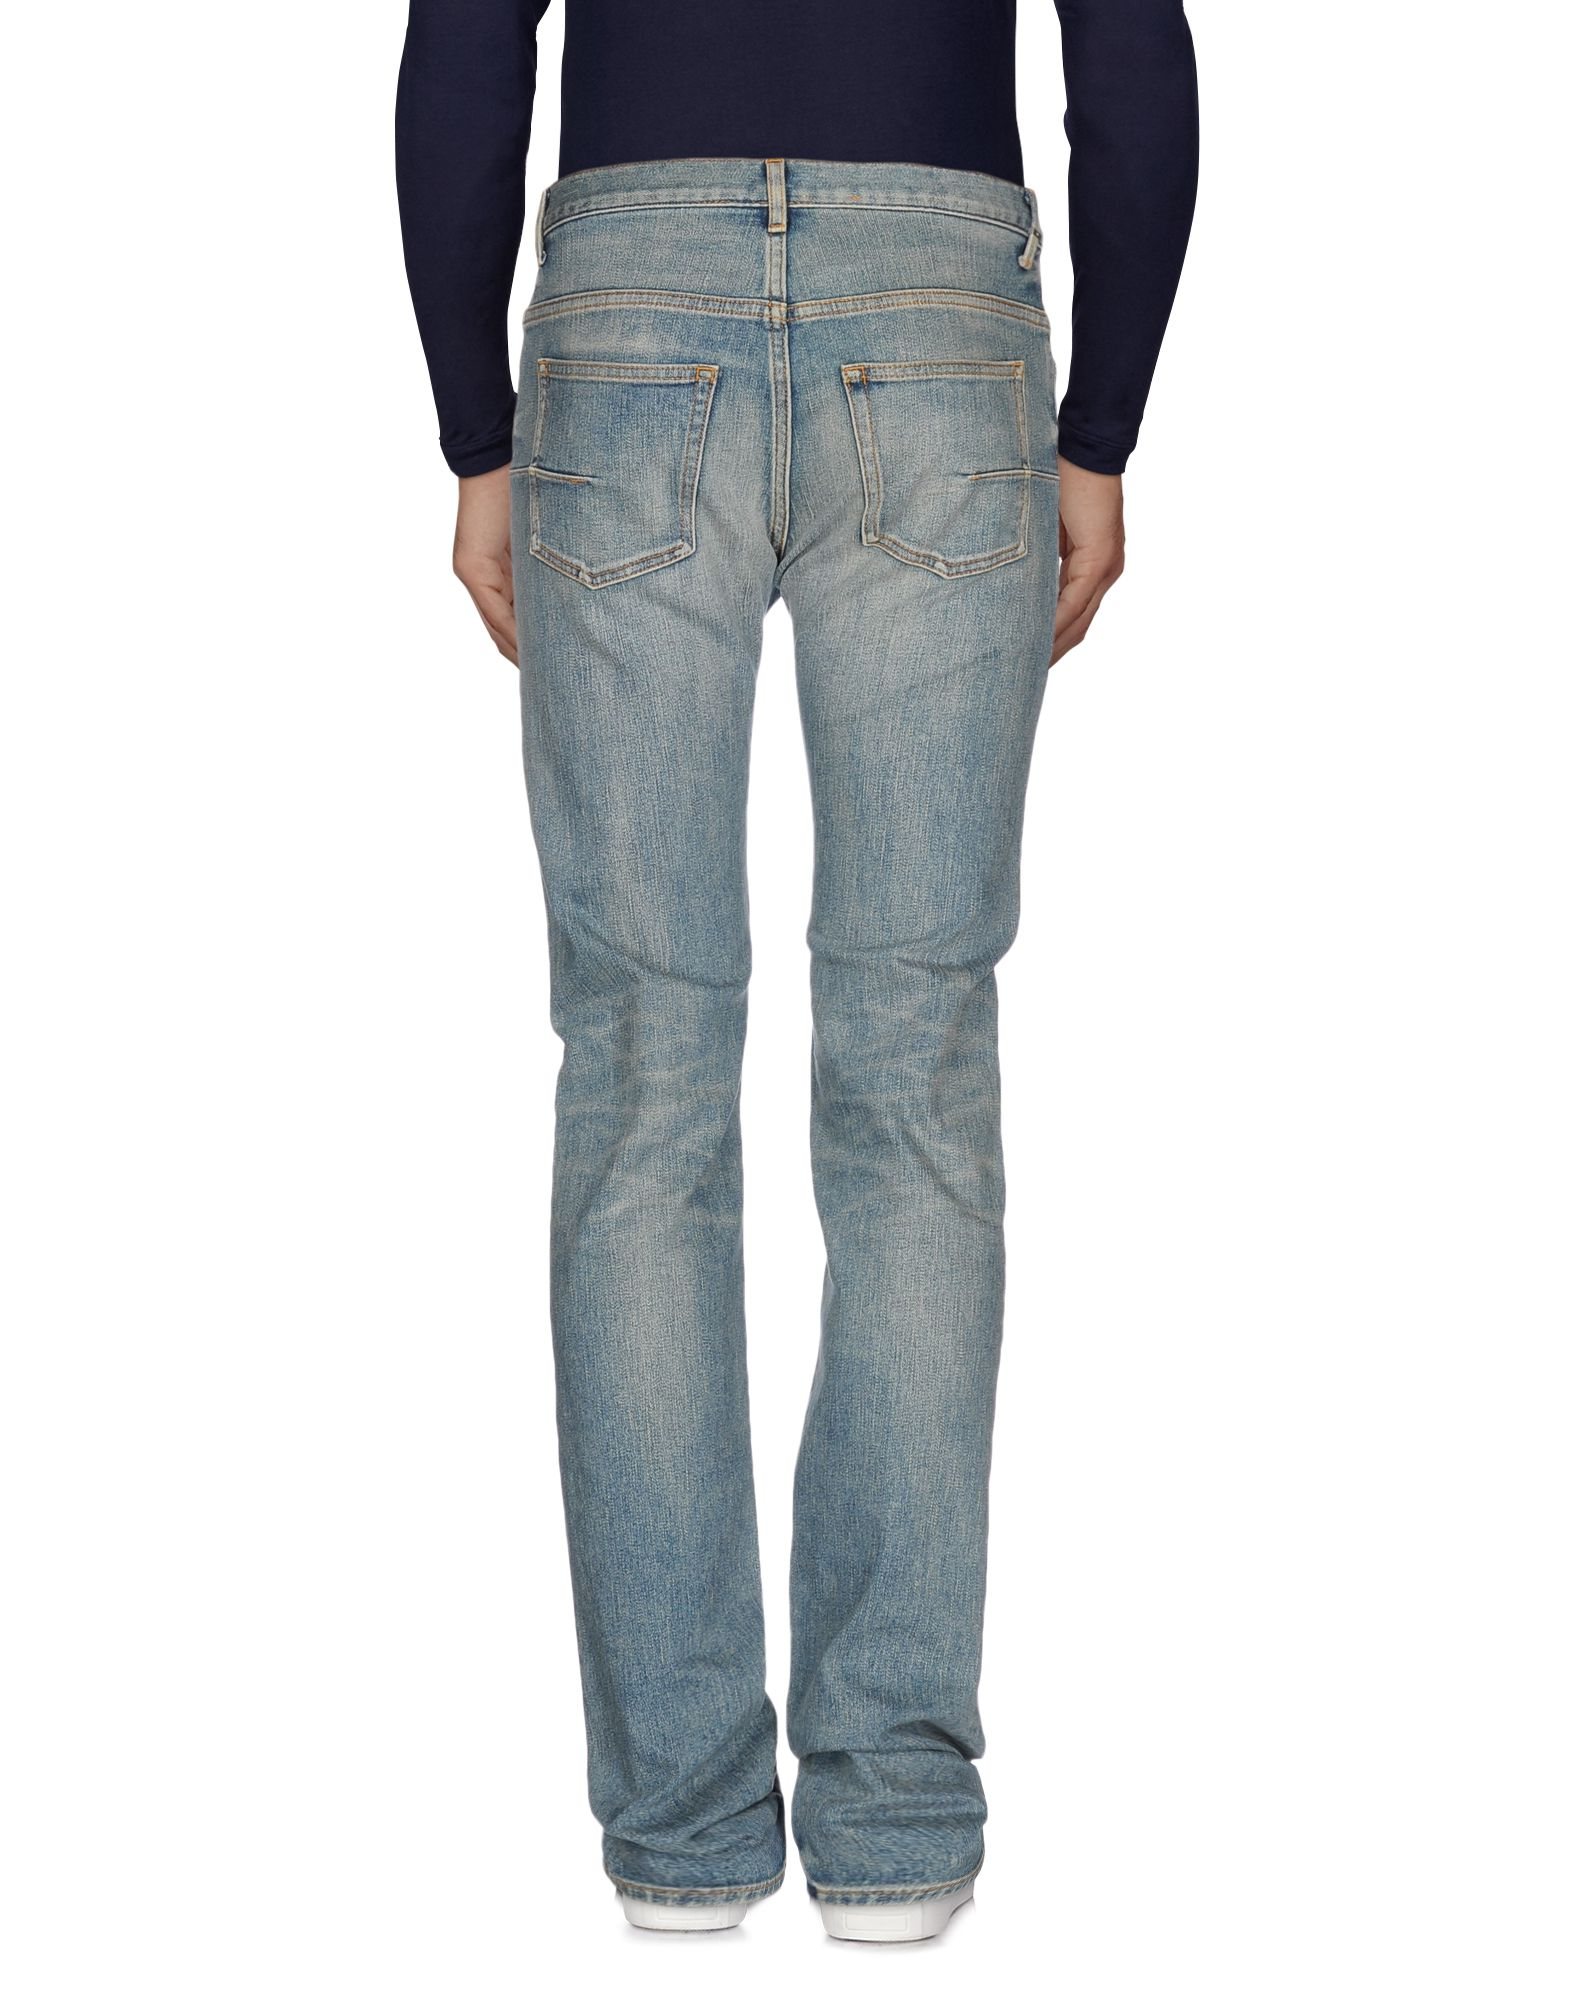 Pantaloni Jeans Dior Uomo Homme Uomo Dior - 42484462EX 74836e